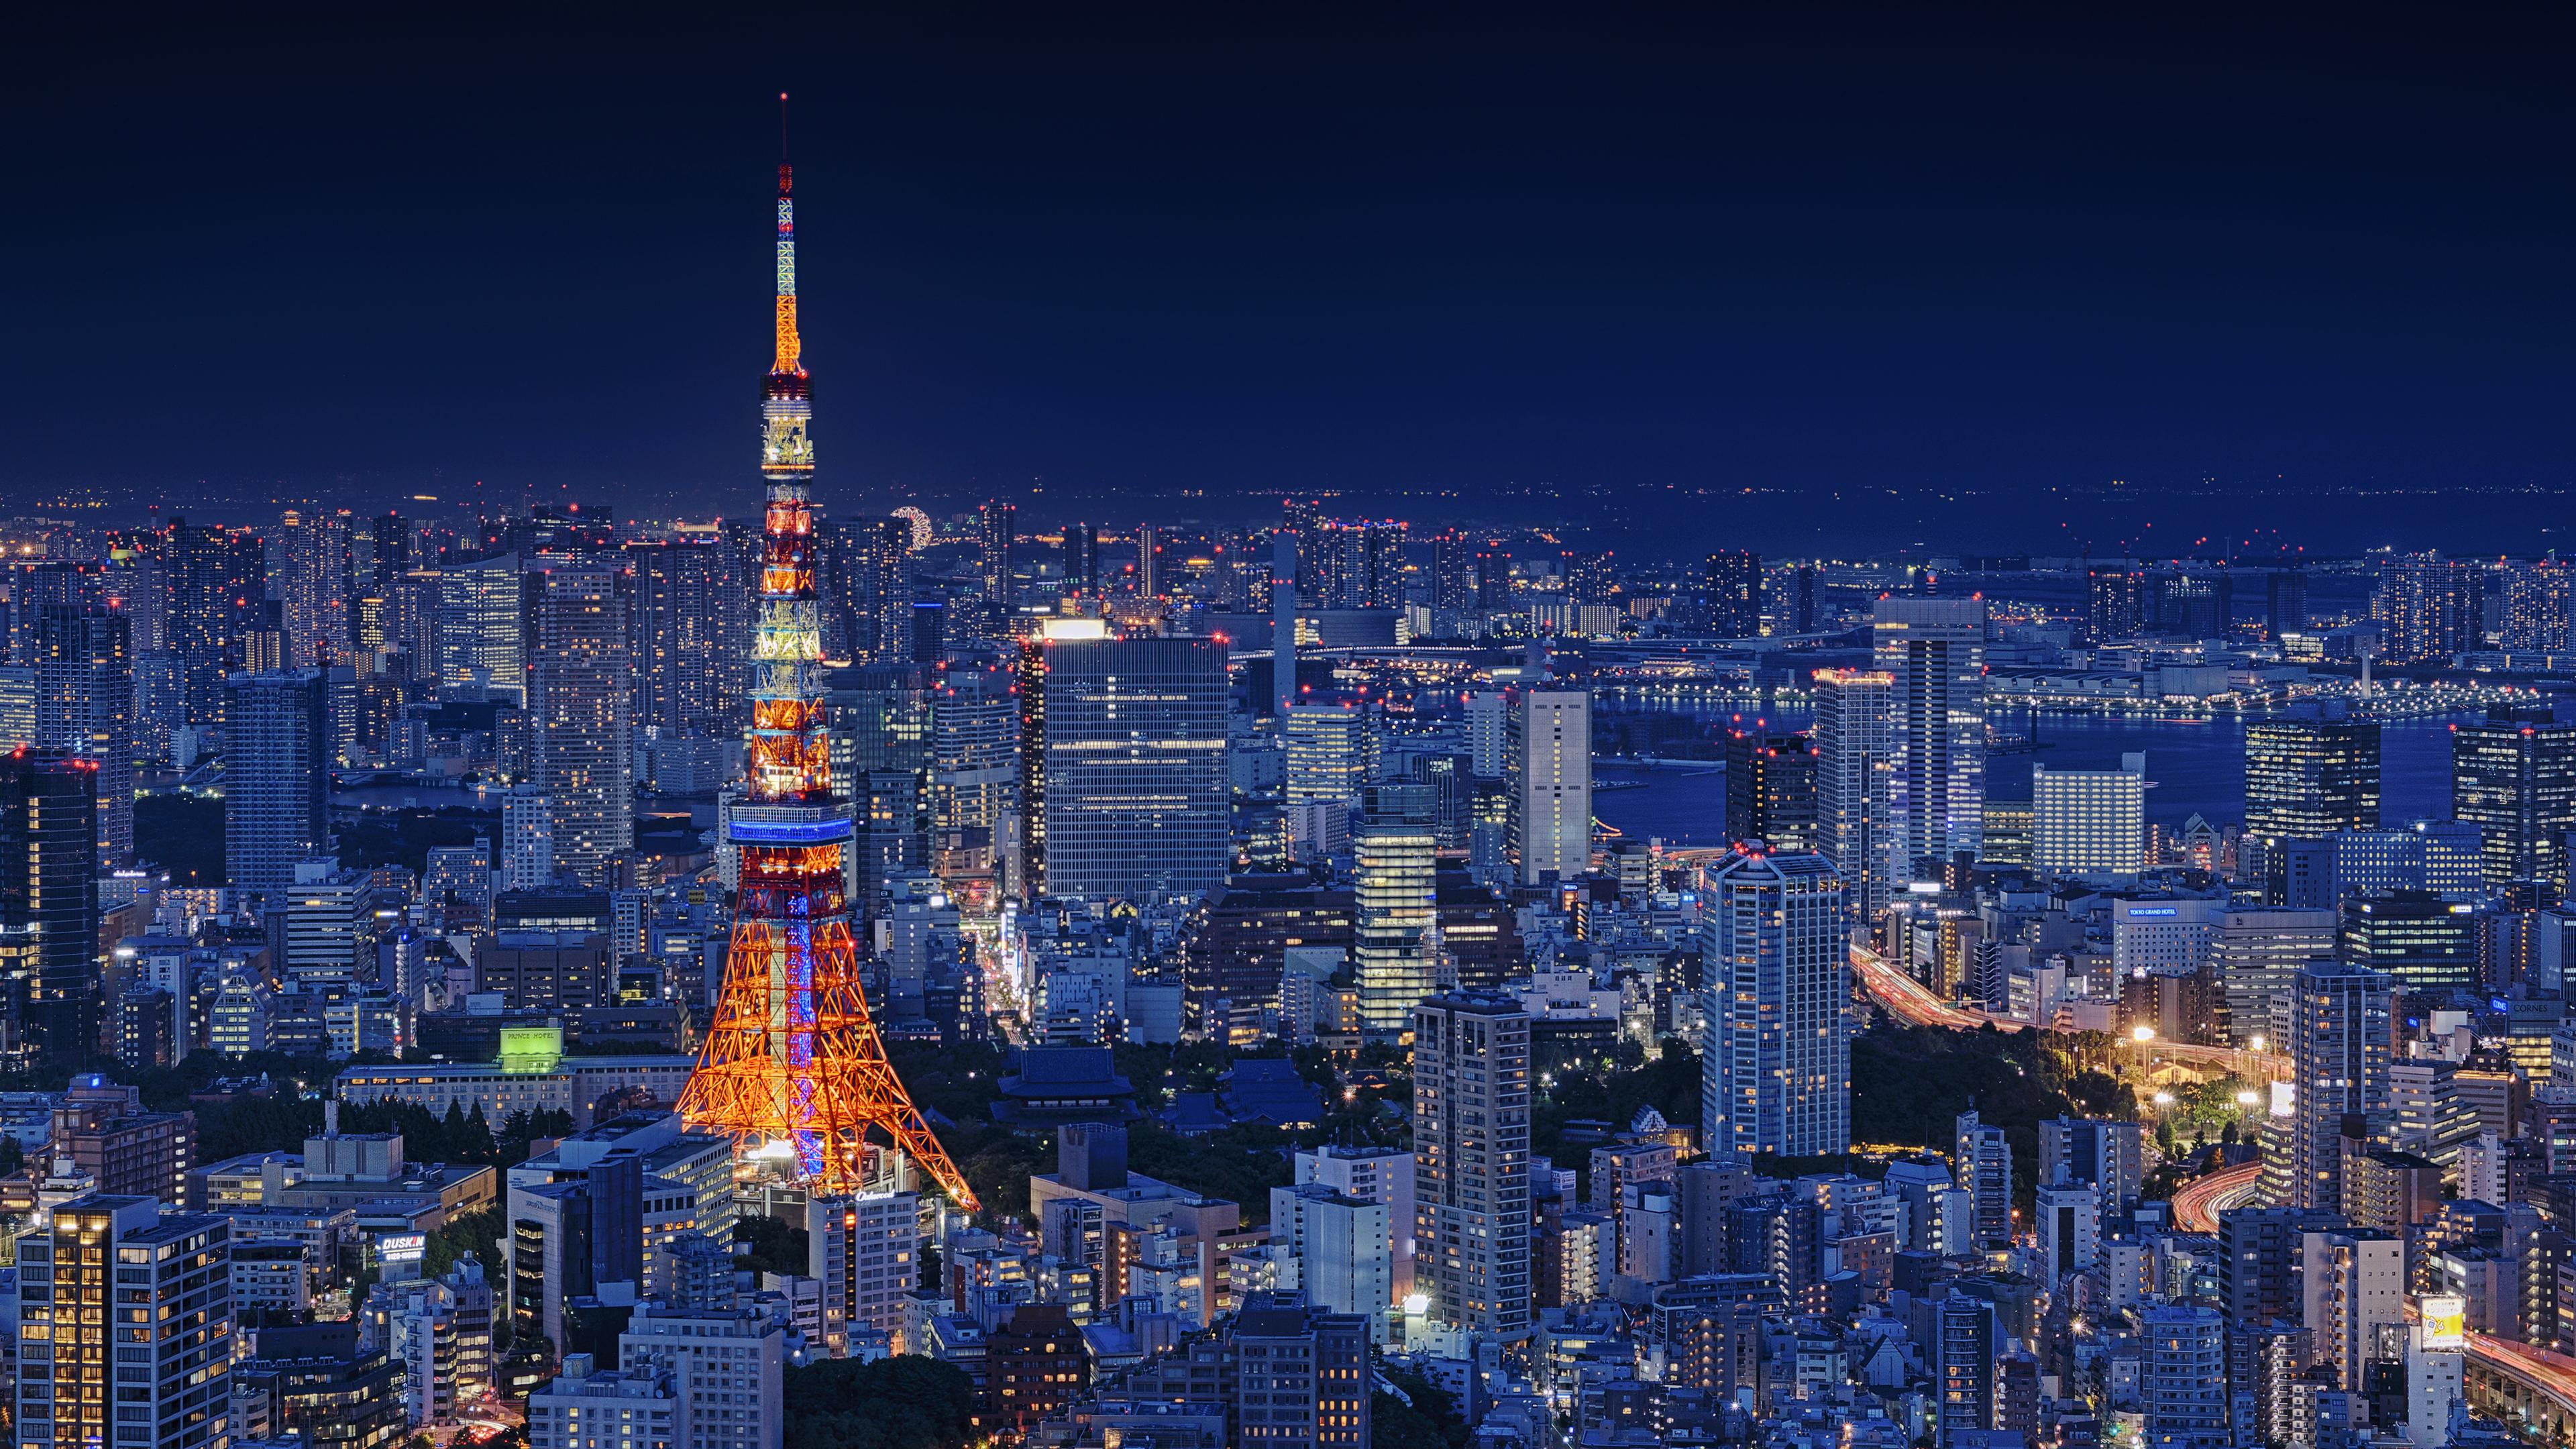 tokyo tower 4k 1538072109 - Tokyo Tower 4k - world wallpapers, tower wallpapers, tokyo wallpapers, tokyo tower wallpapers, skycrapper wallpapers, photography wallpapers, hd-wallpapers, buildings wallpapers, 4k-wallpapers